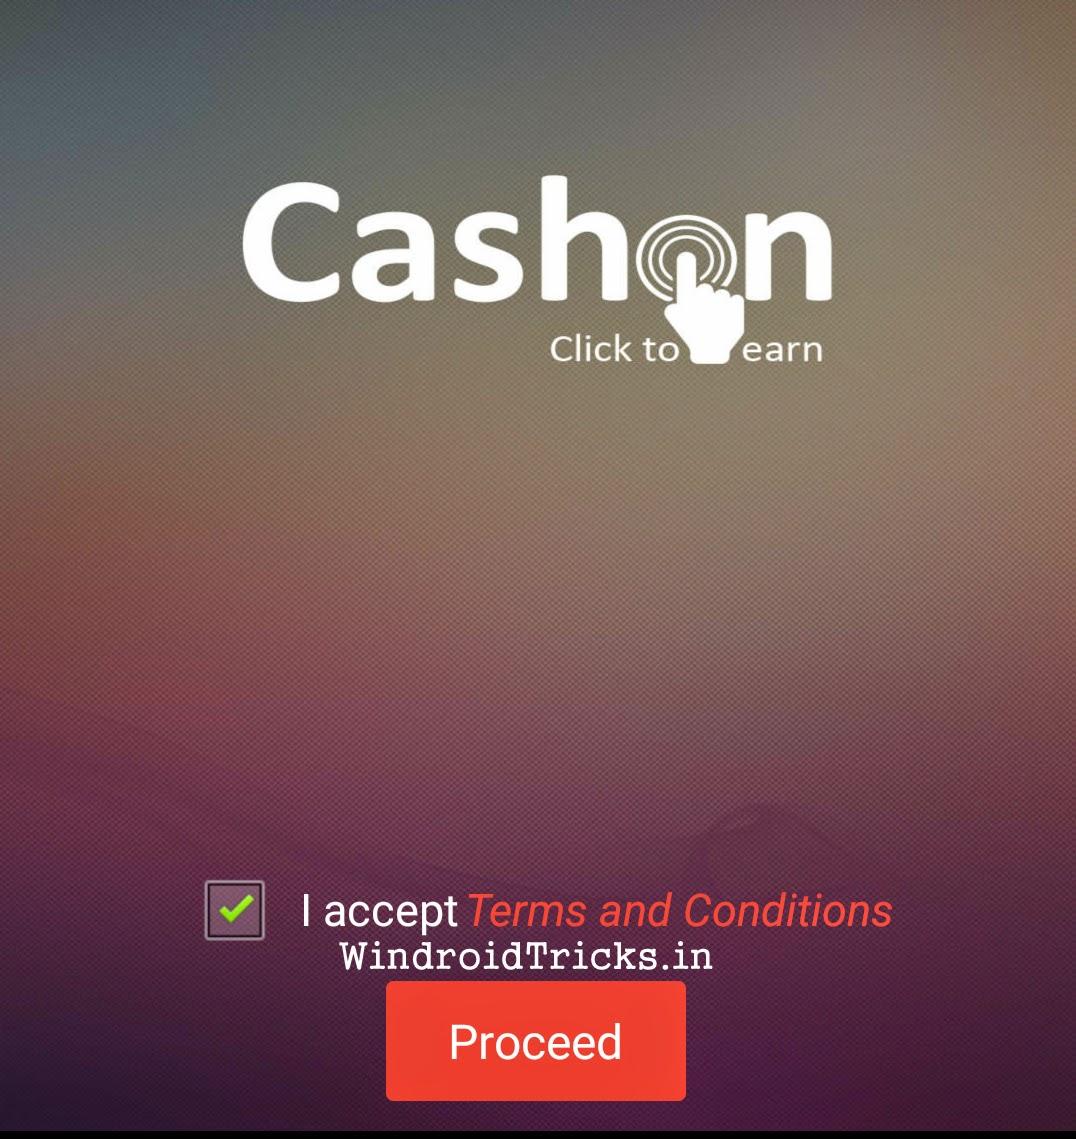 cashon-free-recharge